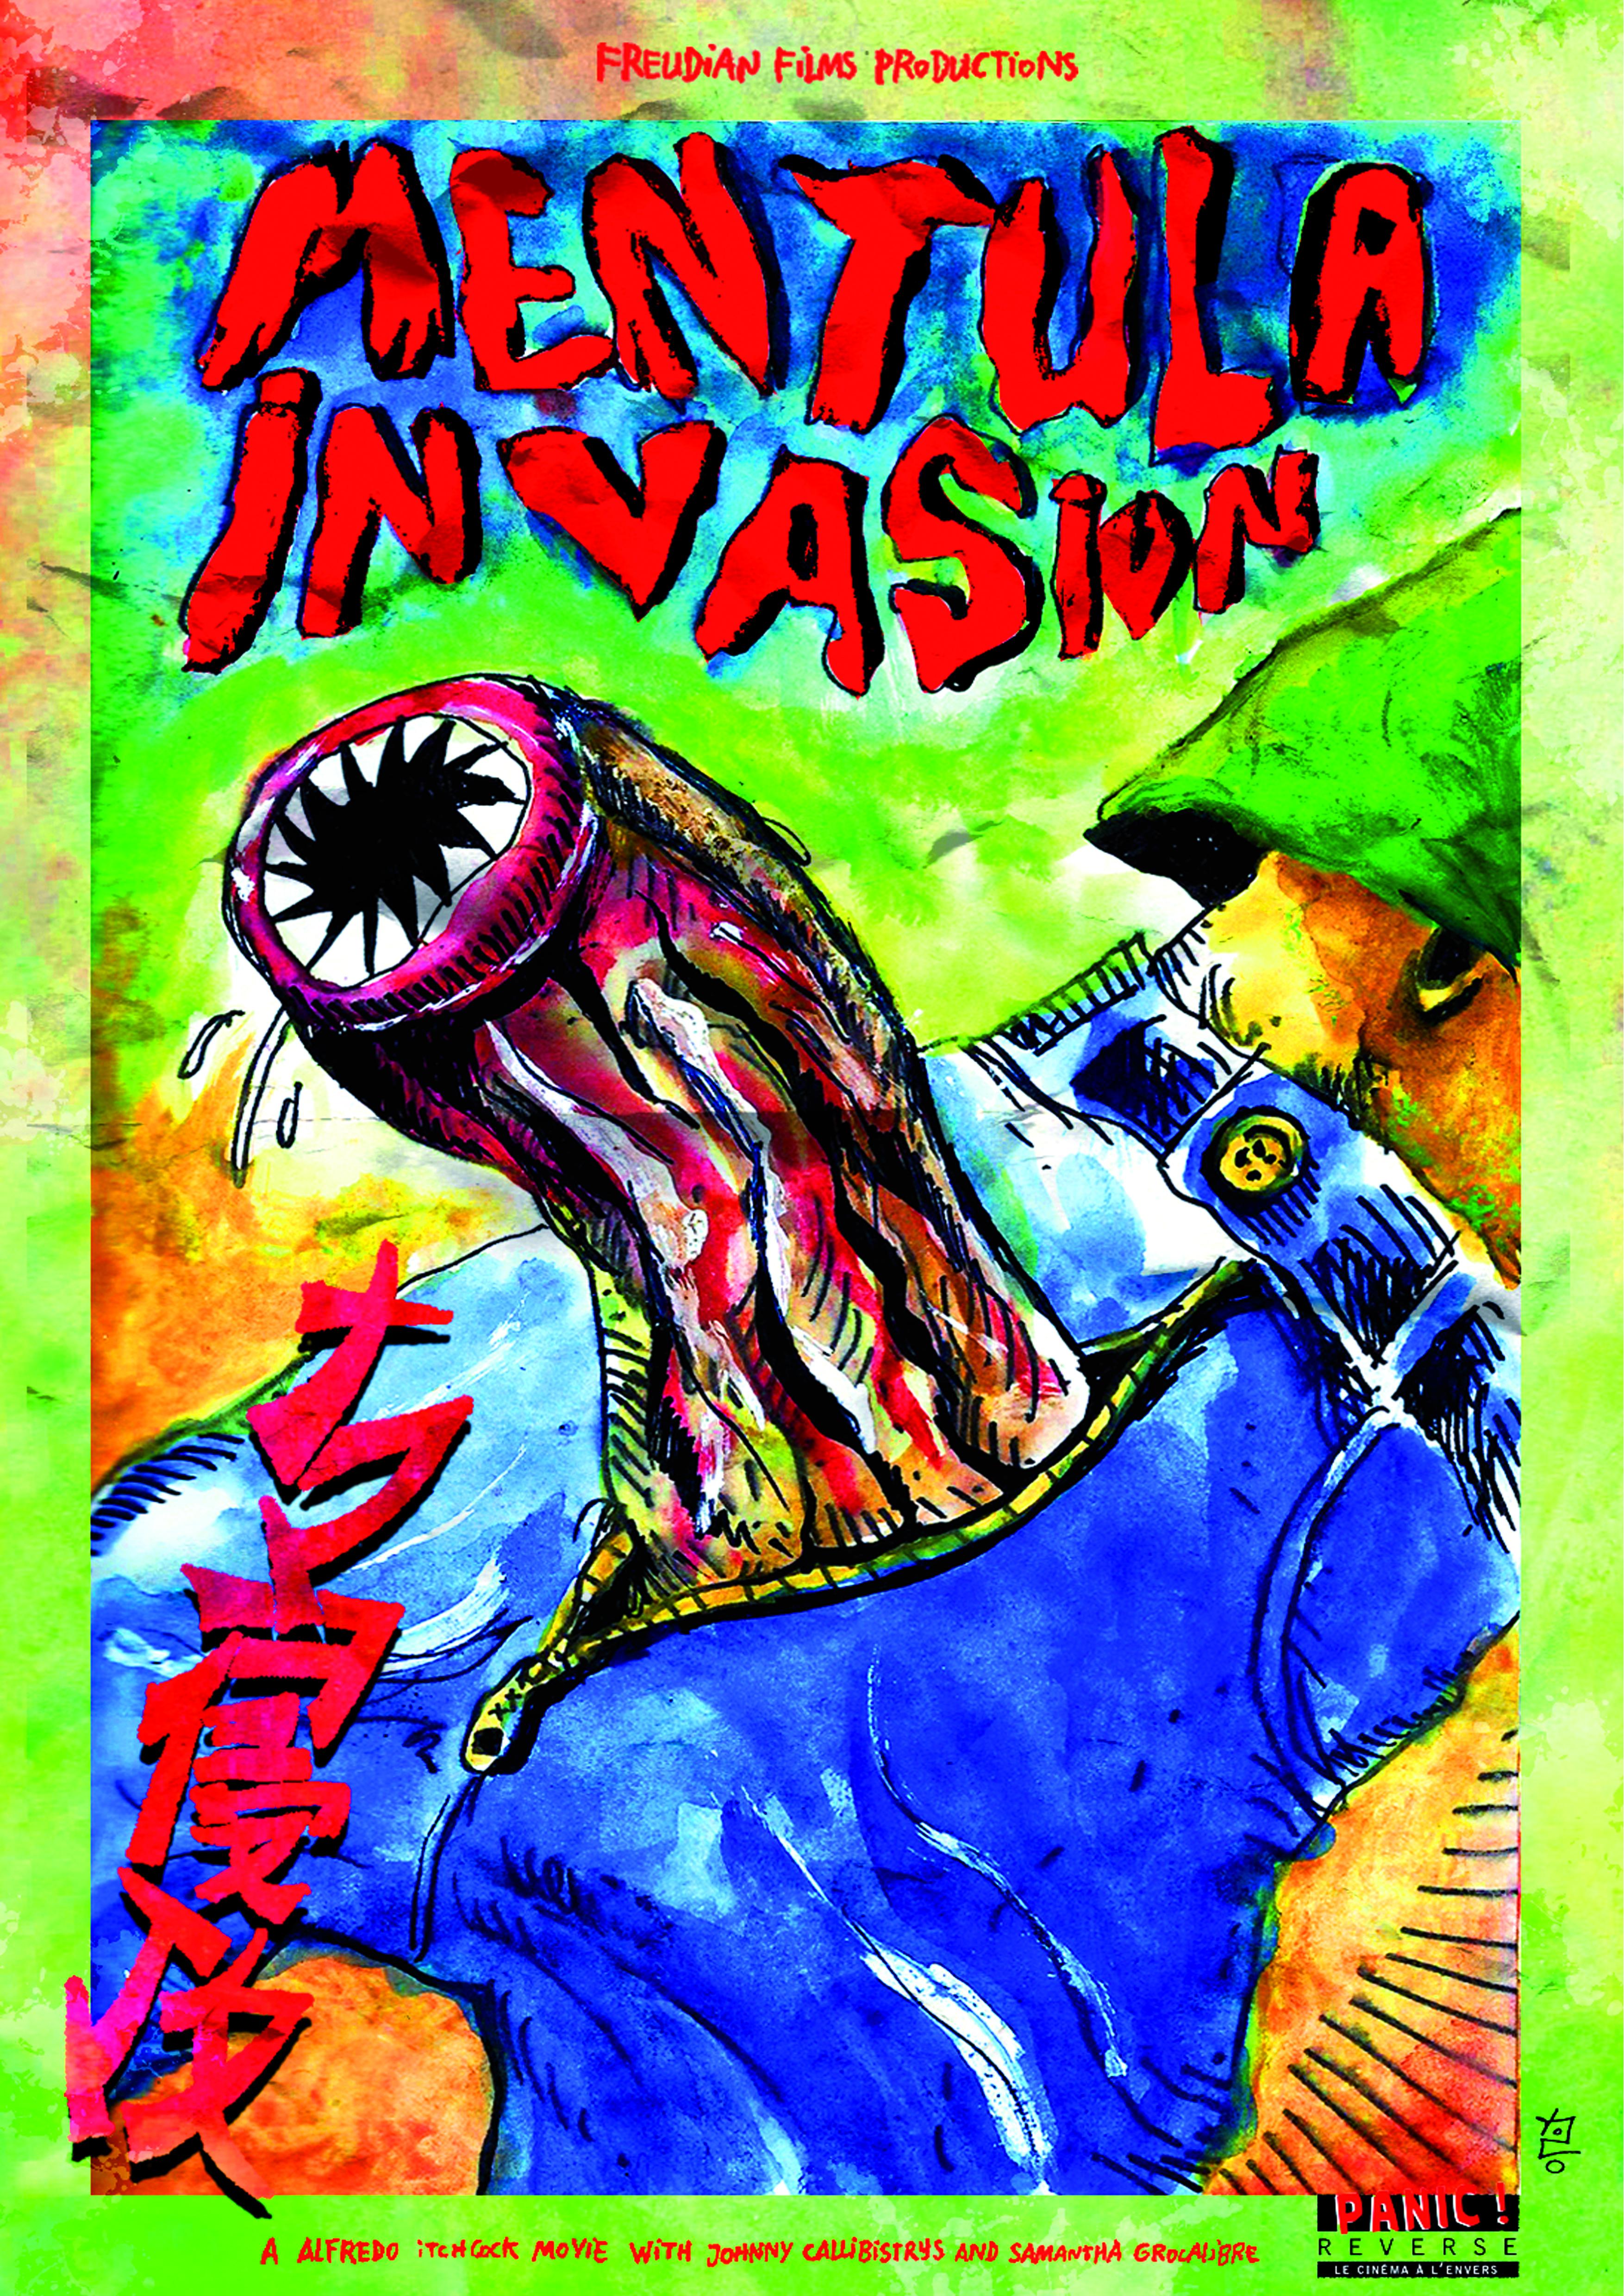 MENTULA INVASION - Tom Cochien